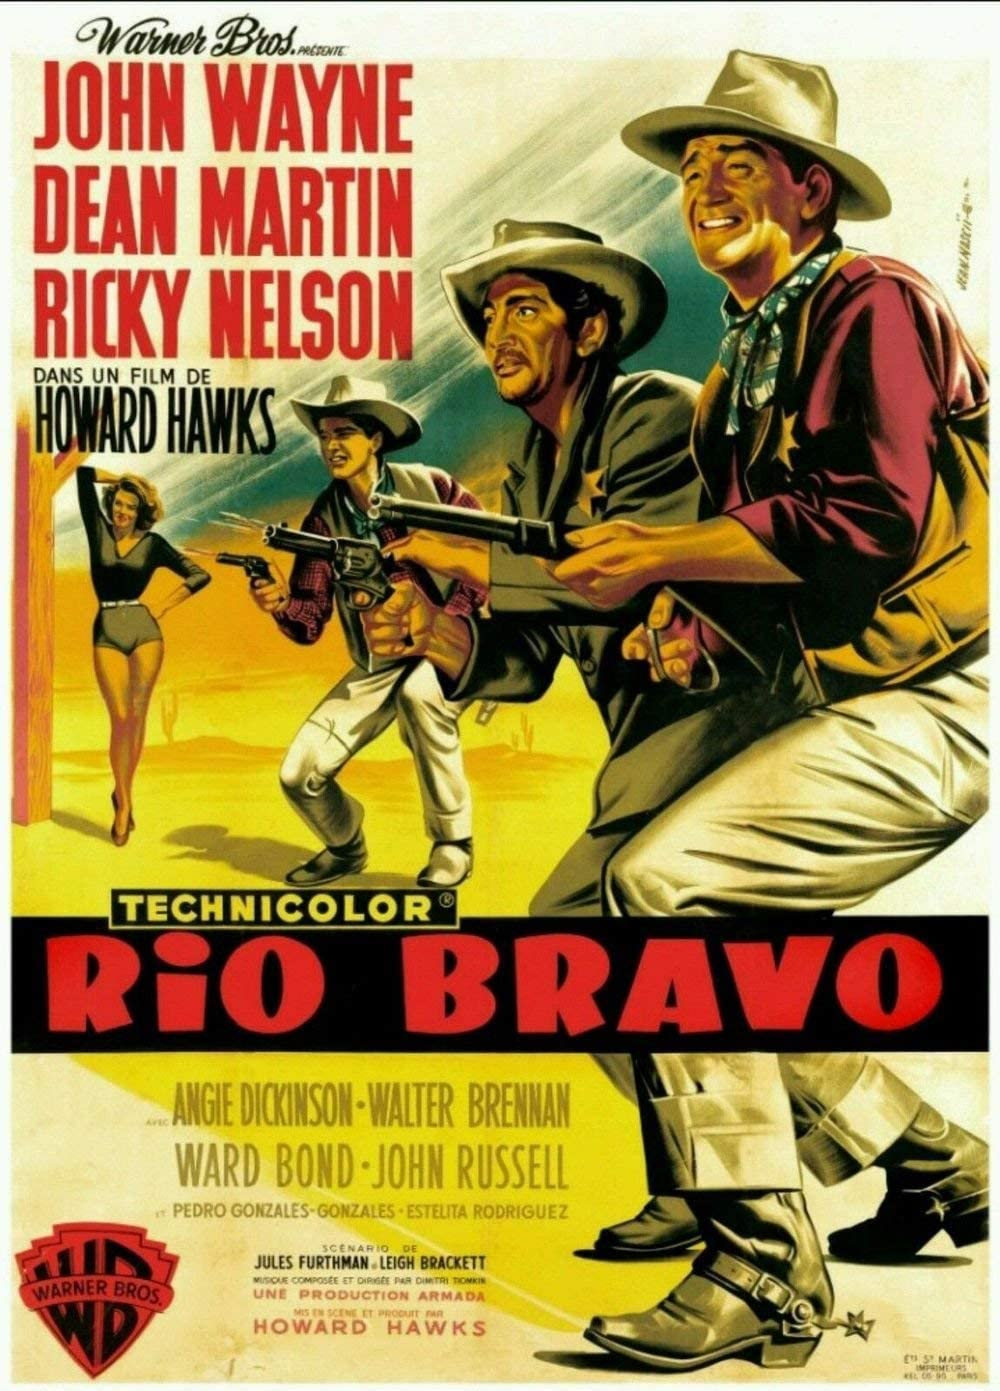 Tomorrow sunny Rio Bravo John Wayne Dean Martin Movie Wall Silk Poster 24X36 inch/60X90cm